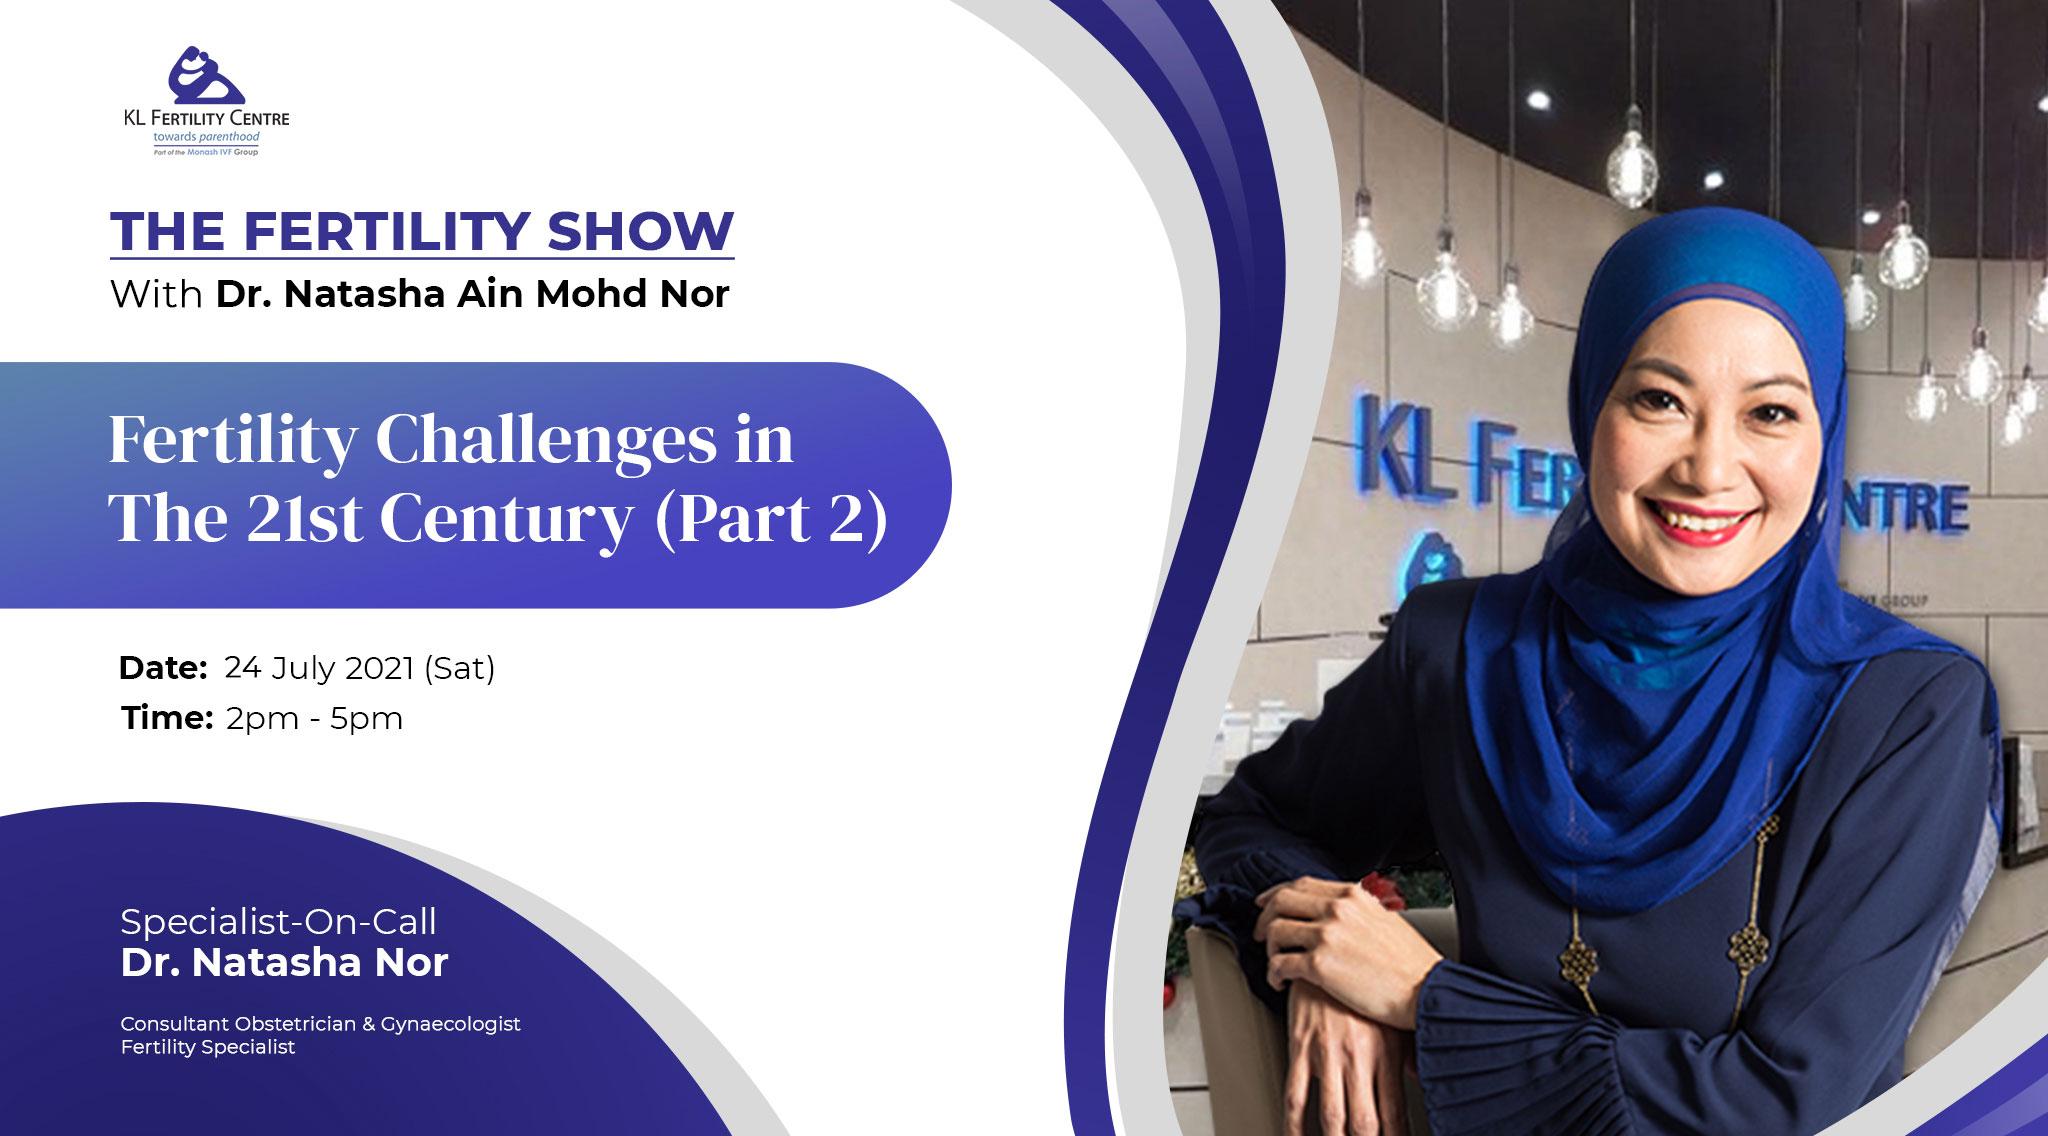 The Fertility Show : Fertility Challenges in The 21st Century (Part 2) - Dr. Natasha Nor